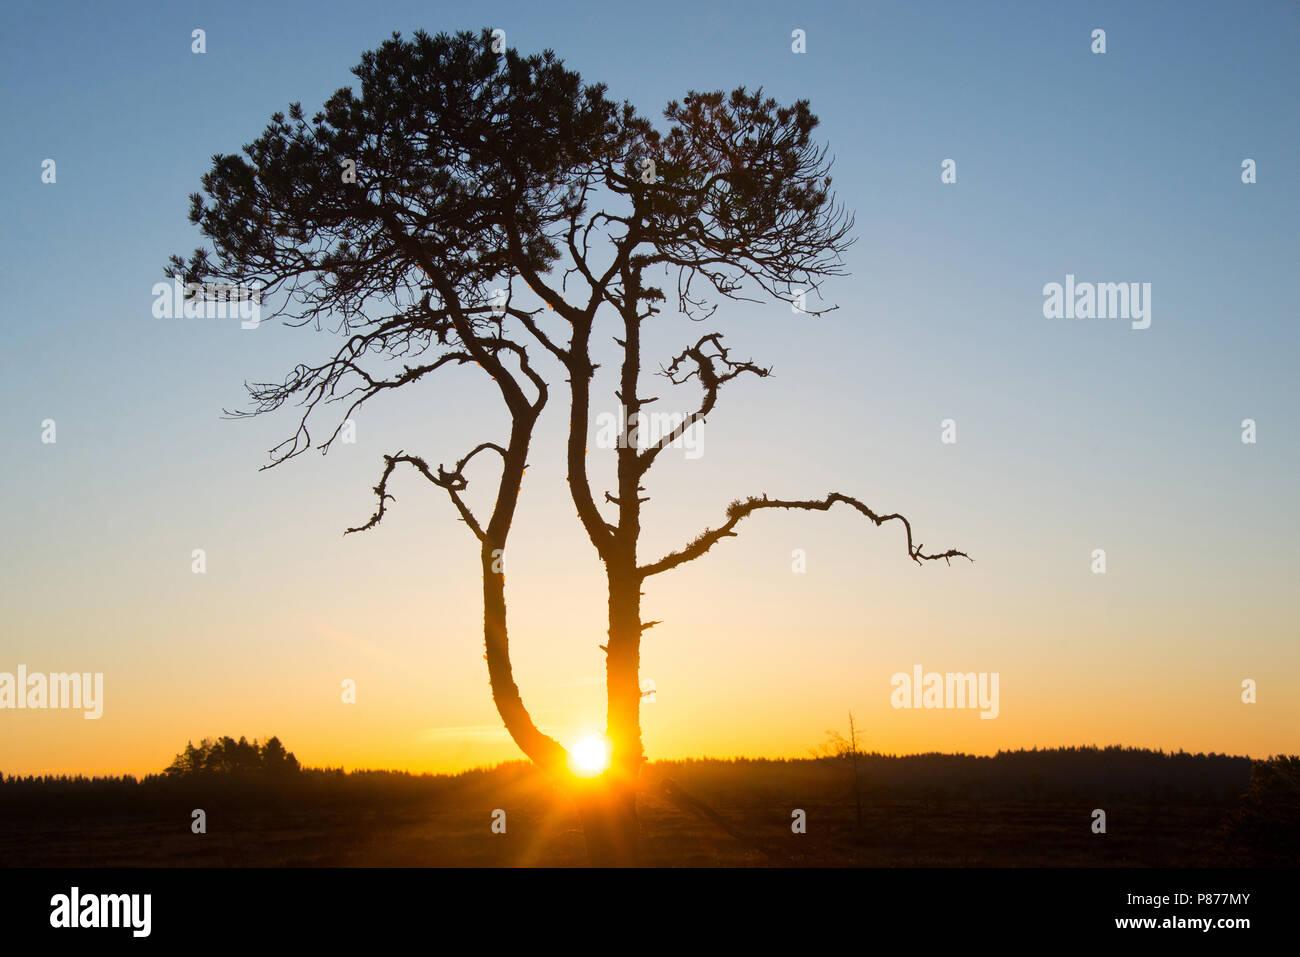 Pinus sylvestris - My sunrise tree. Torronsuo National Park, Finland. Stock Photo